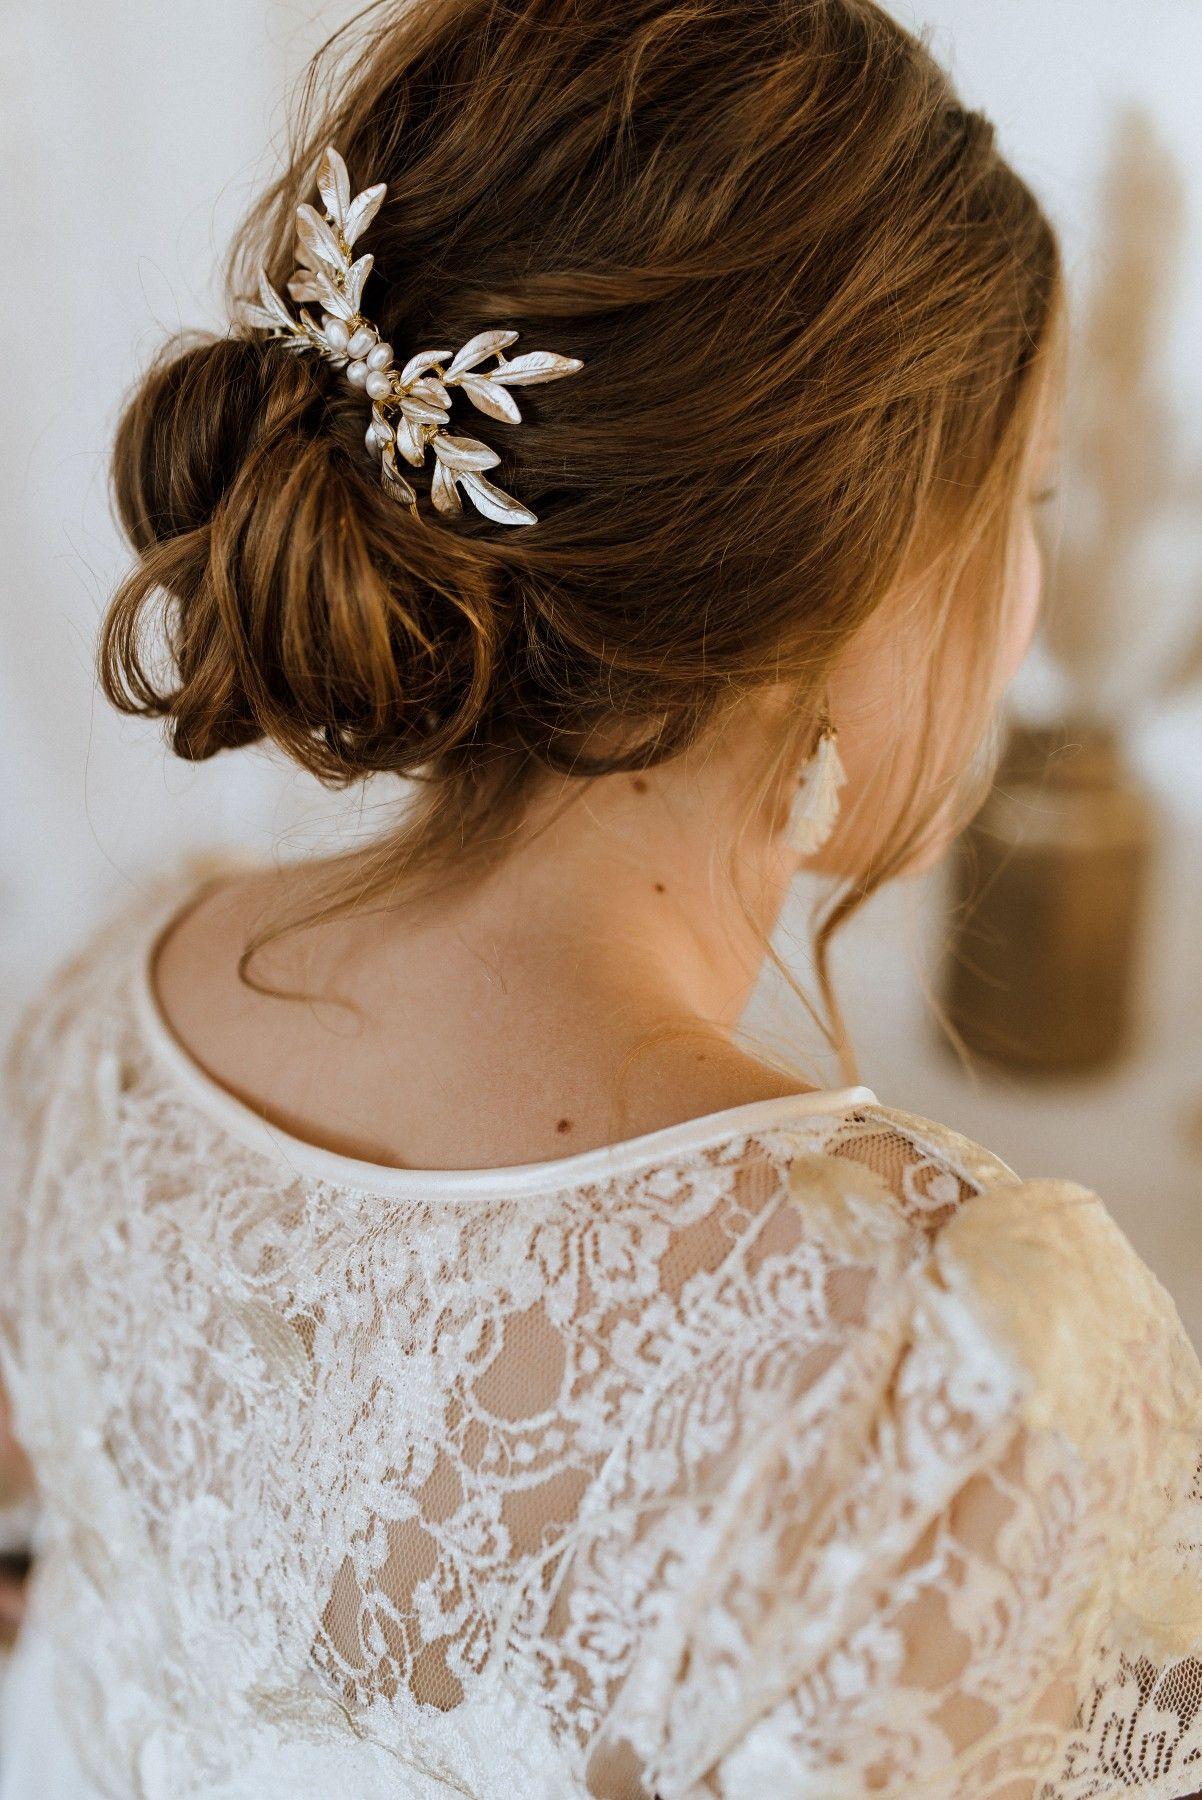 Labude Koeln - Bridal hairstyle loose updo  Brautfrisur, Frisur